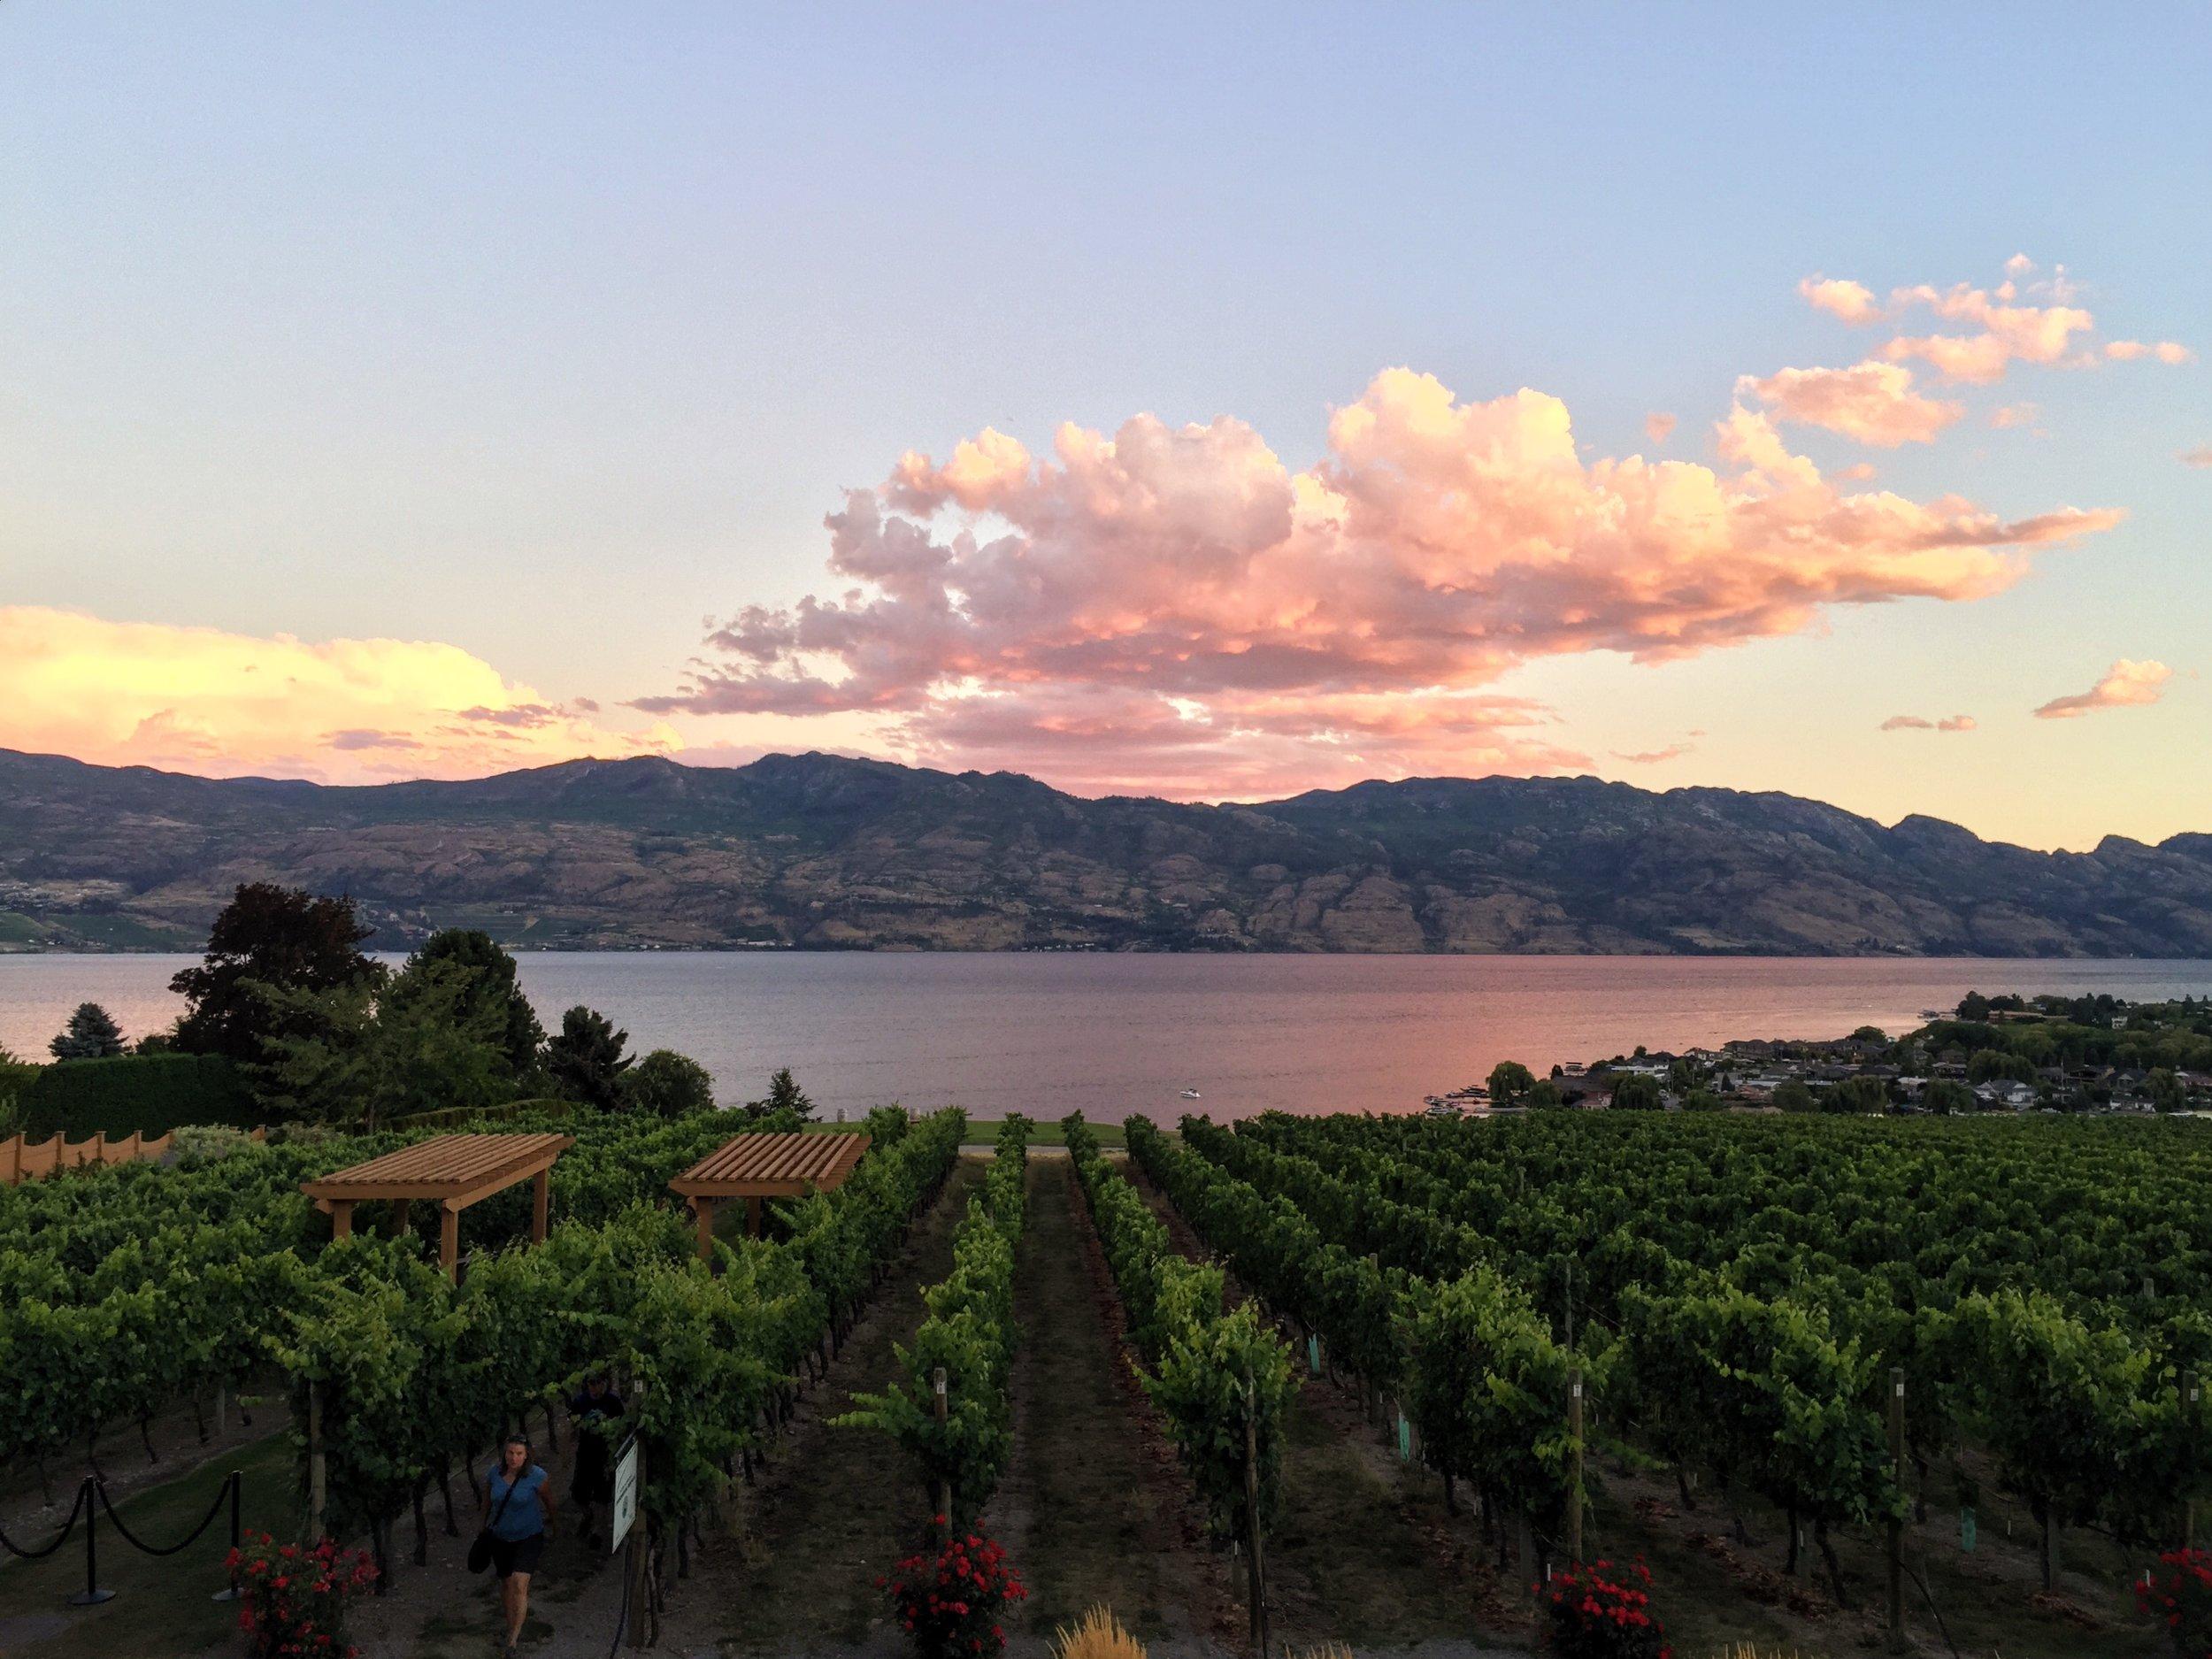 Quails' Gate Winery,Okanagan Valley, Kelowna